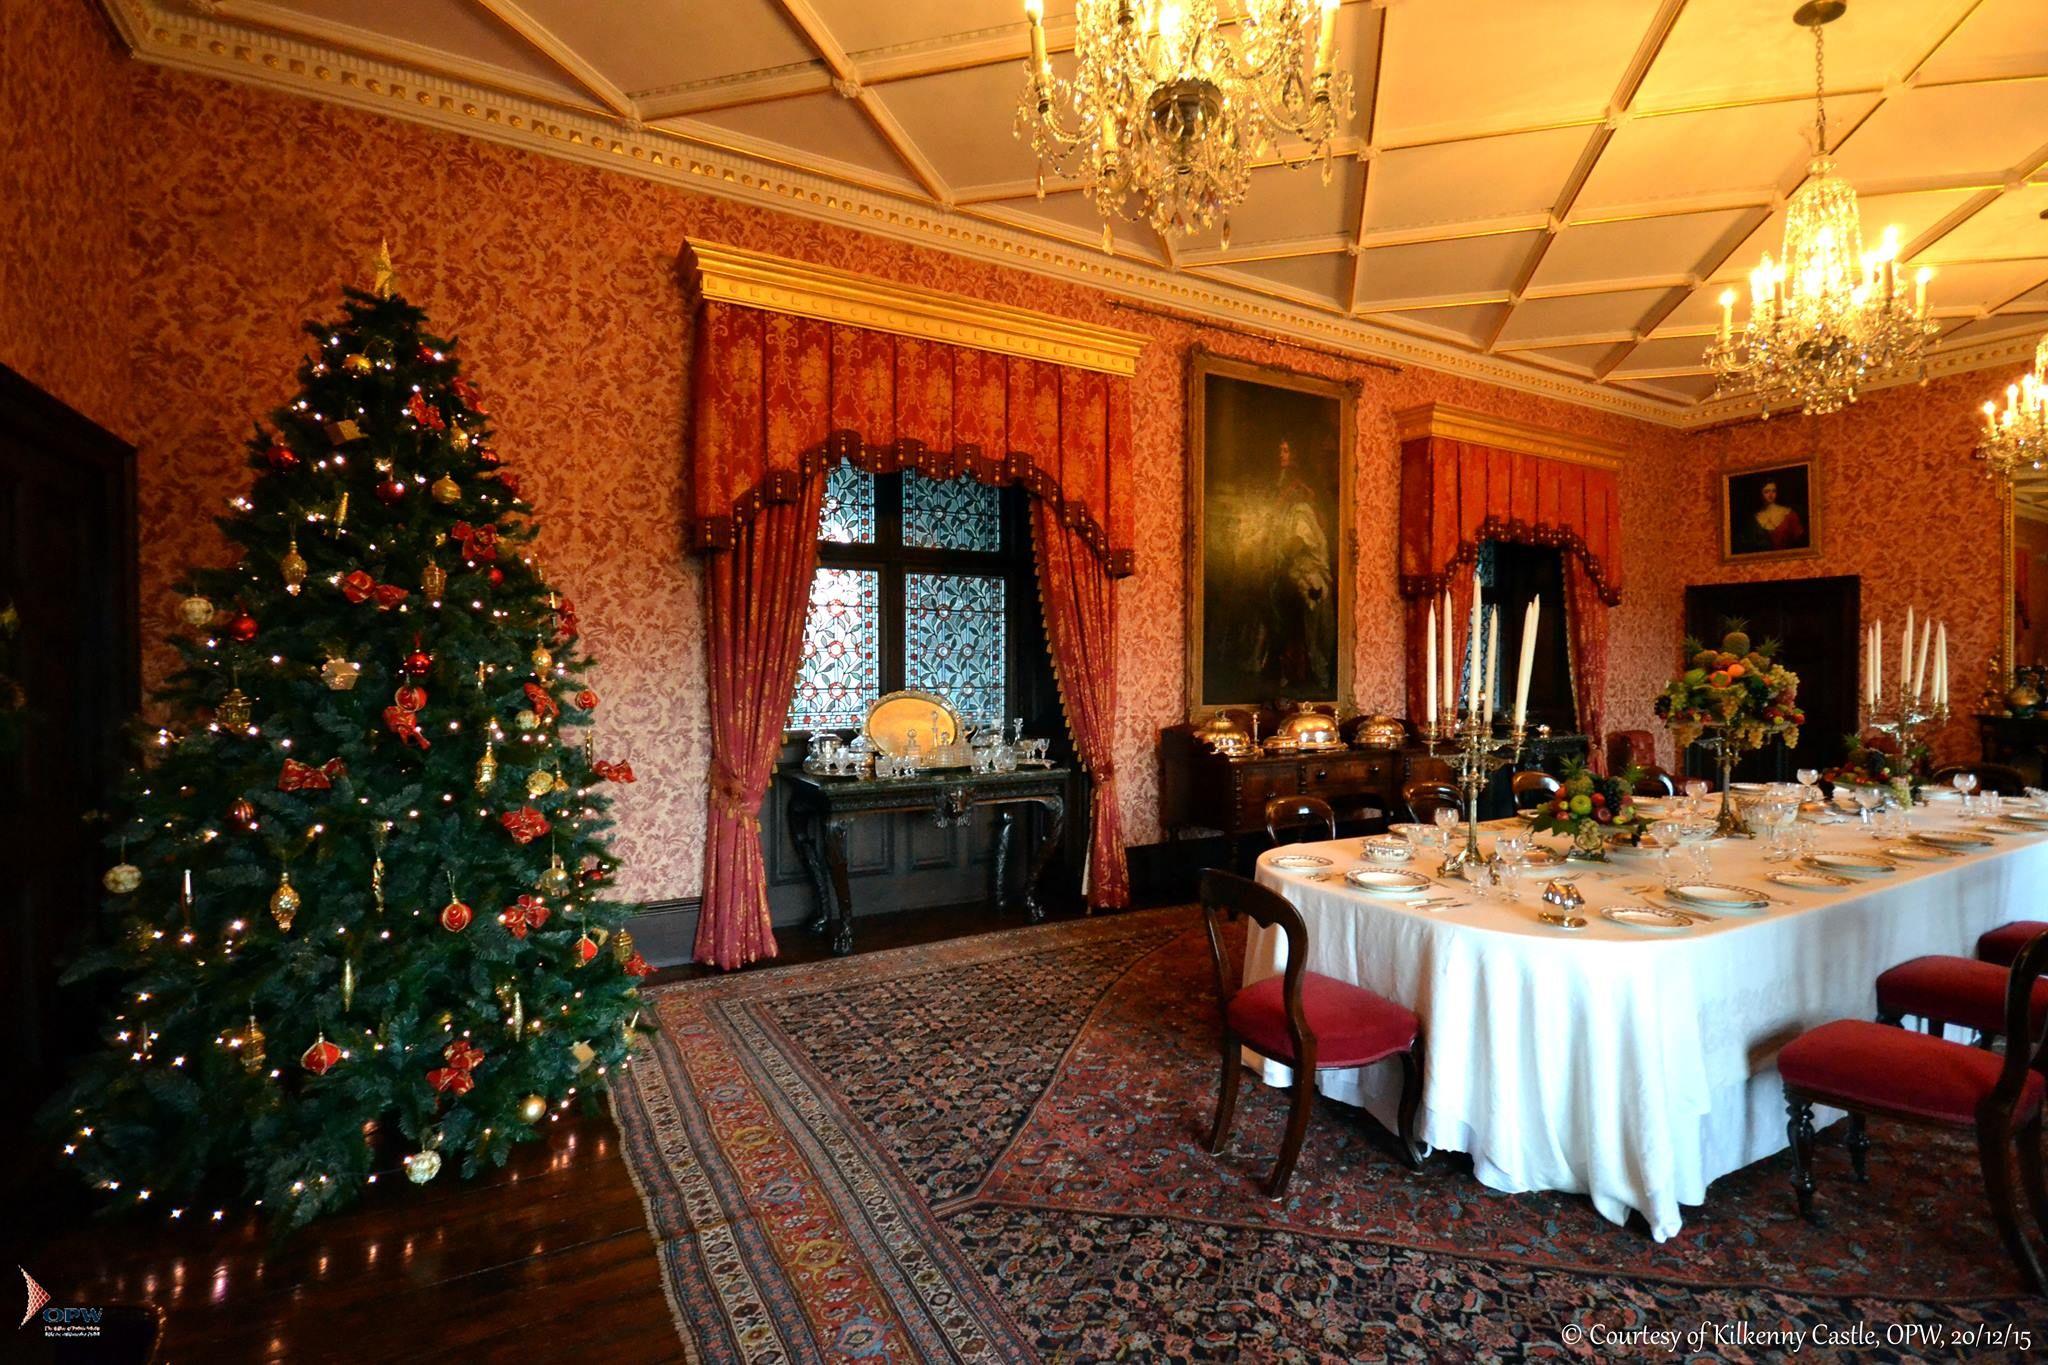 Kilkenny Castle at Christmas